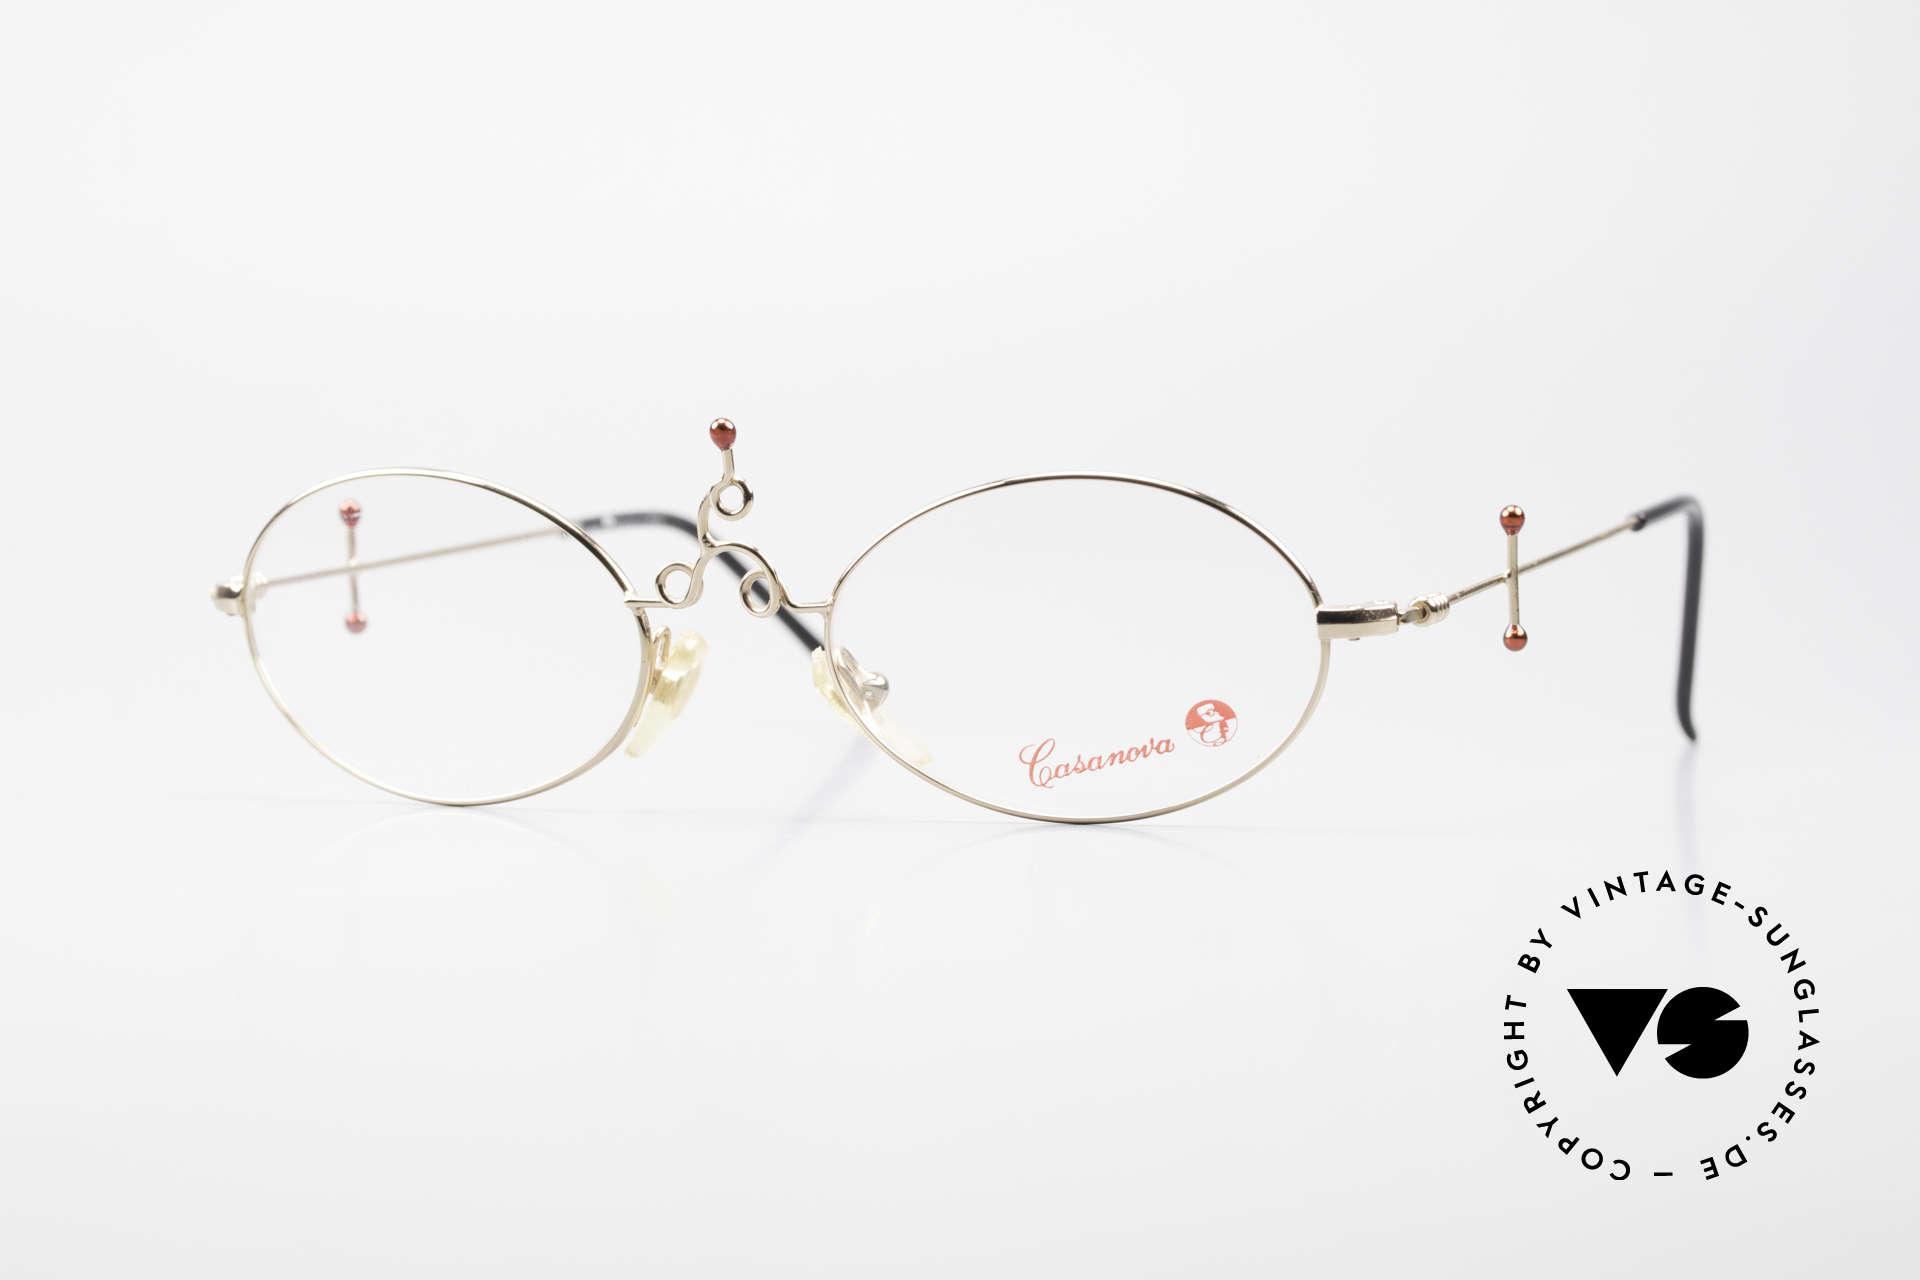 Casanova Arché 1 Art Glasses 80's Gold Plated, glamorous CASANOVA luxury eyeglasses from the 80's, Made for Women